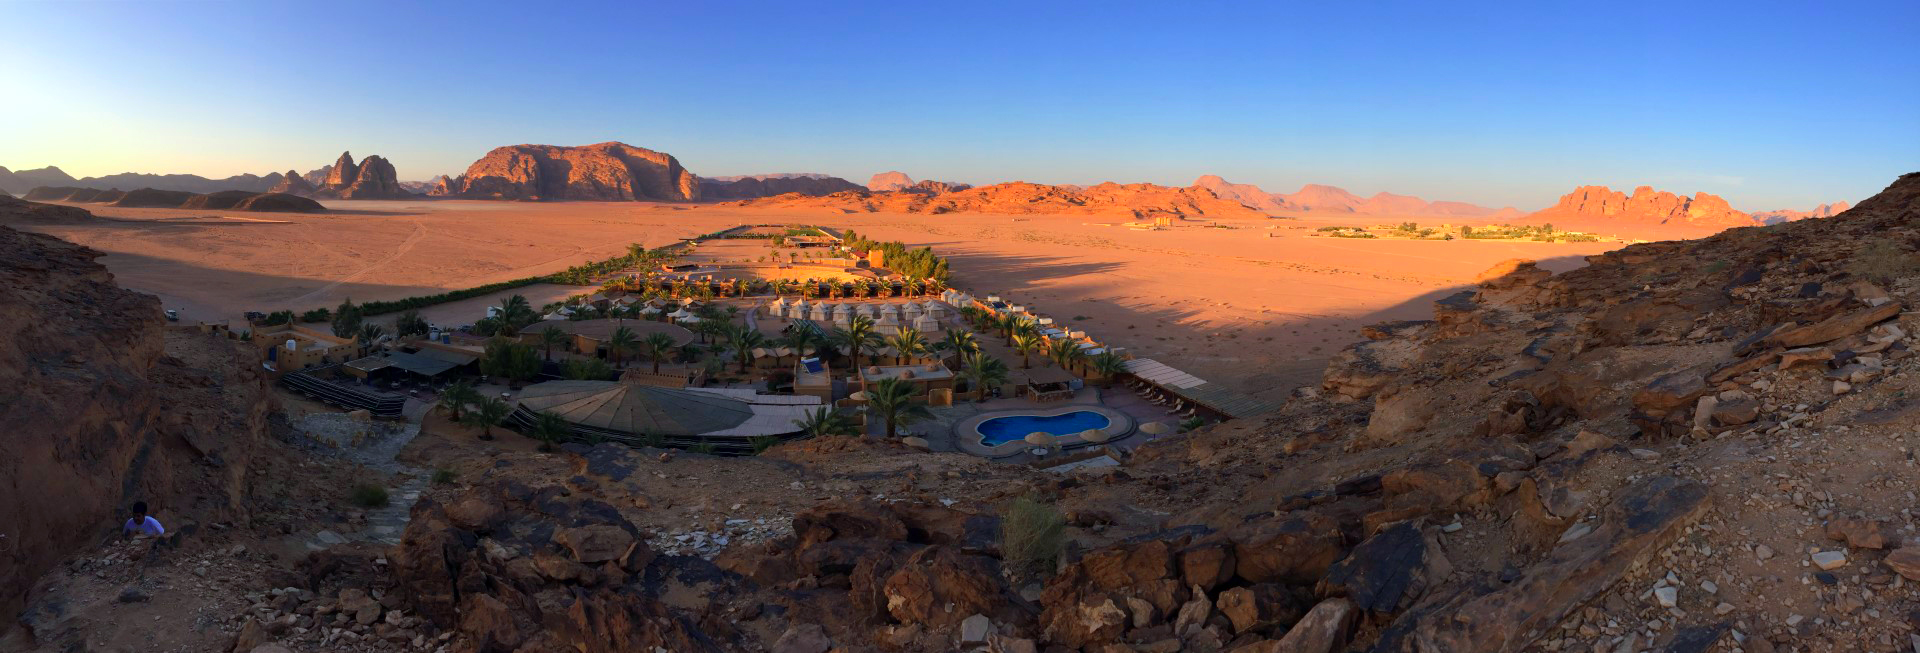 Qué ver en Wadi Rum: Desierto de Wadi Rum en Jordania qué ver en wadi rum - 28254696476 2c360d8331 o - Qué ver en Wadi Rum, Jordania